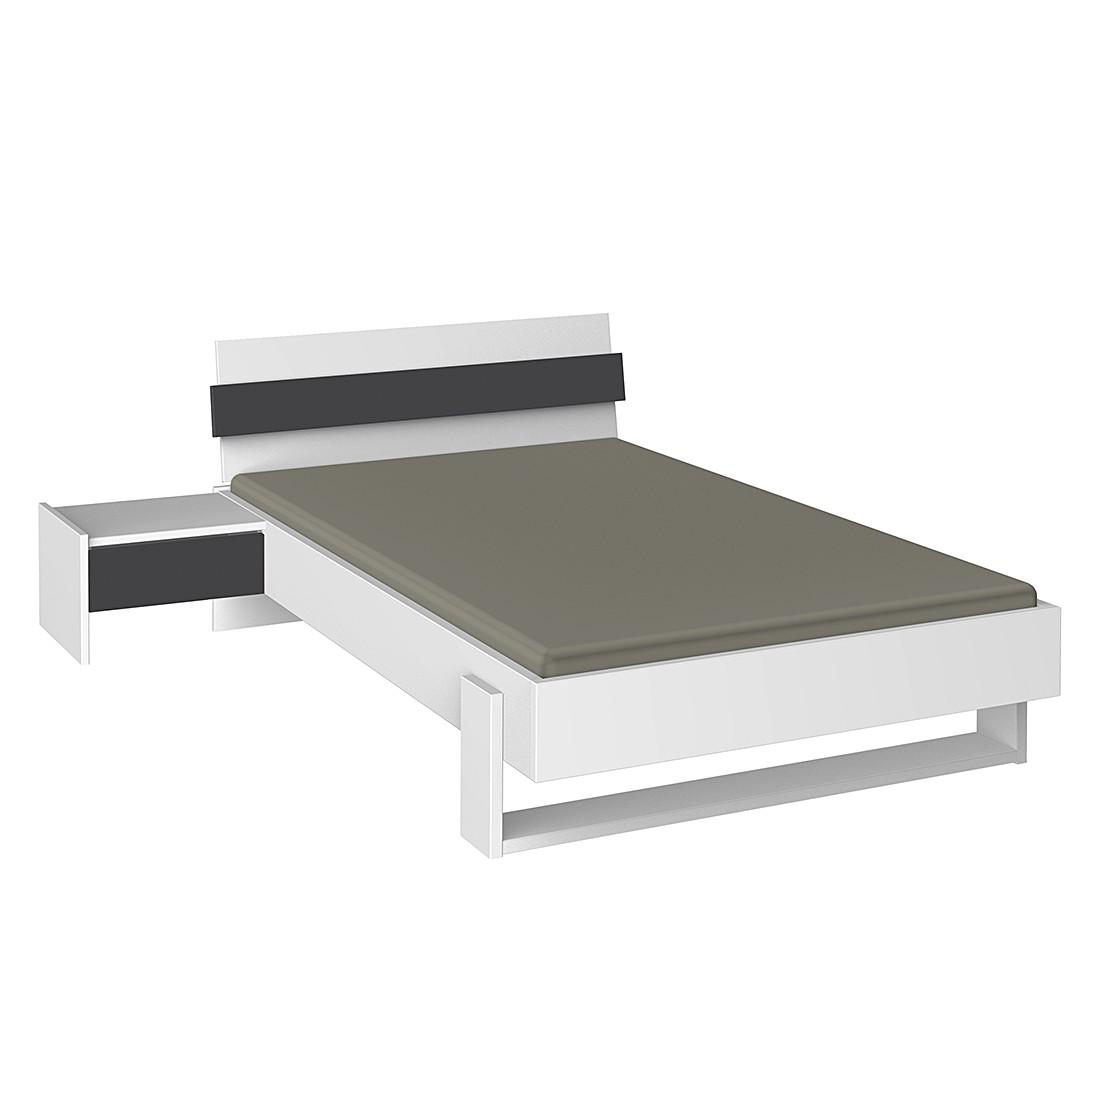 jugendbett 100 x 200 cm wei. Black Bedroom Furniture Sets. Home Design Ideas